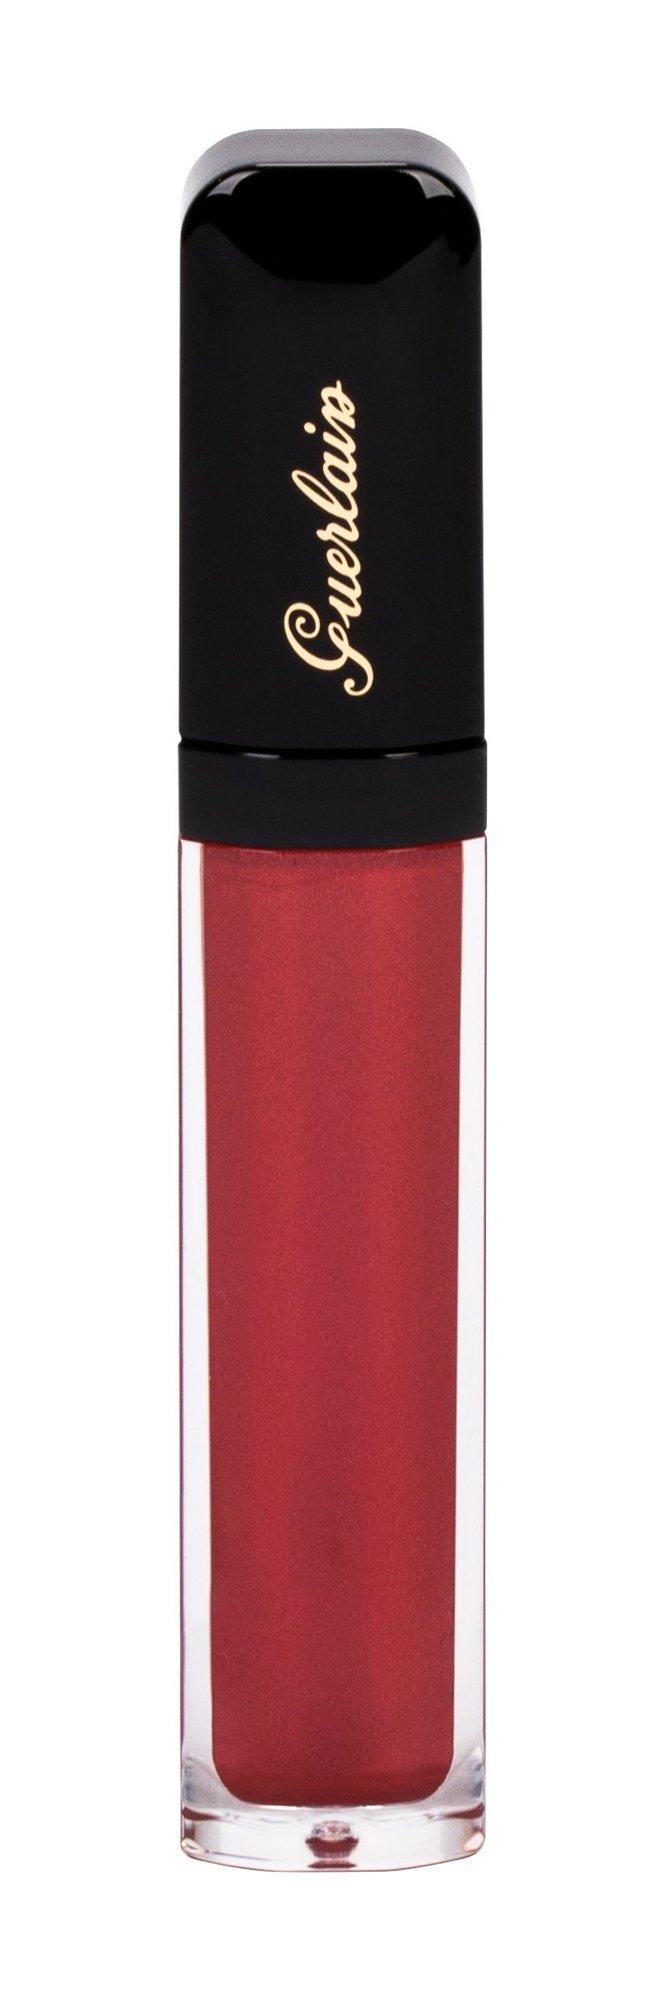 Guerlain Maxi Shine Lip Gloss 7,5ml 921 Electric Red